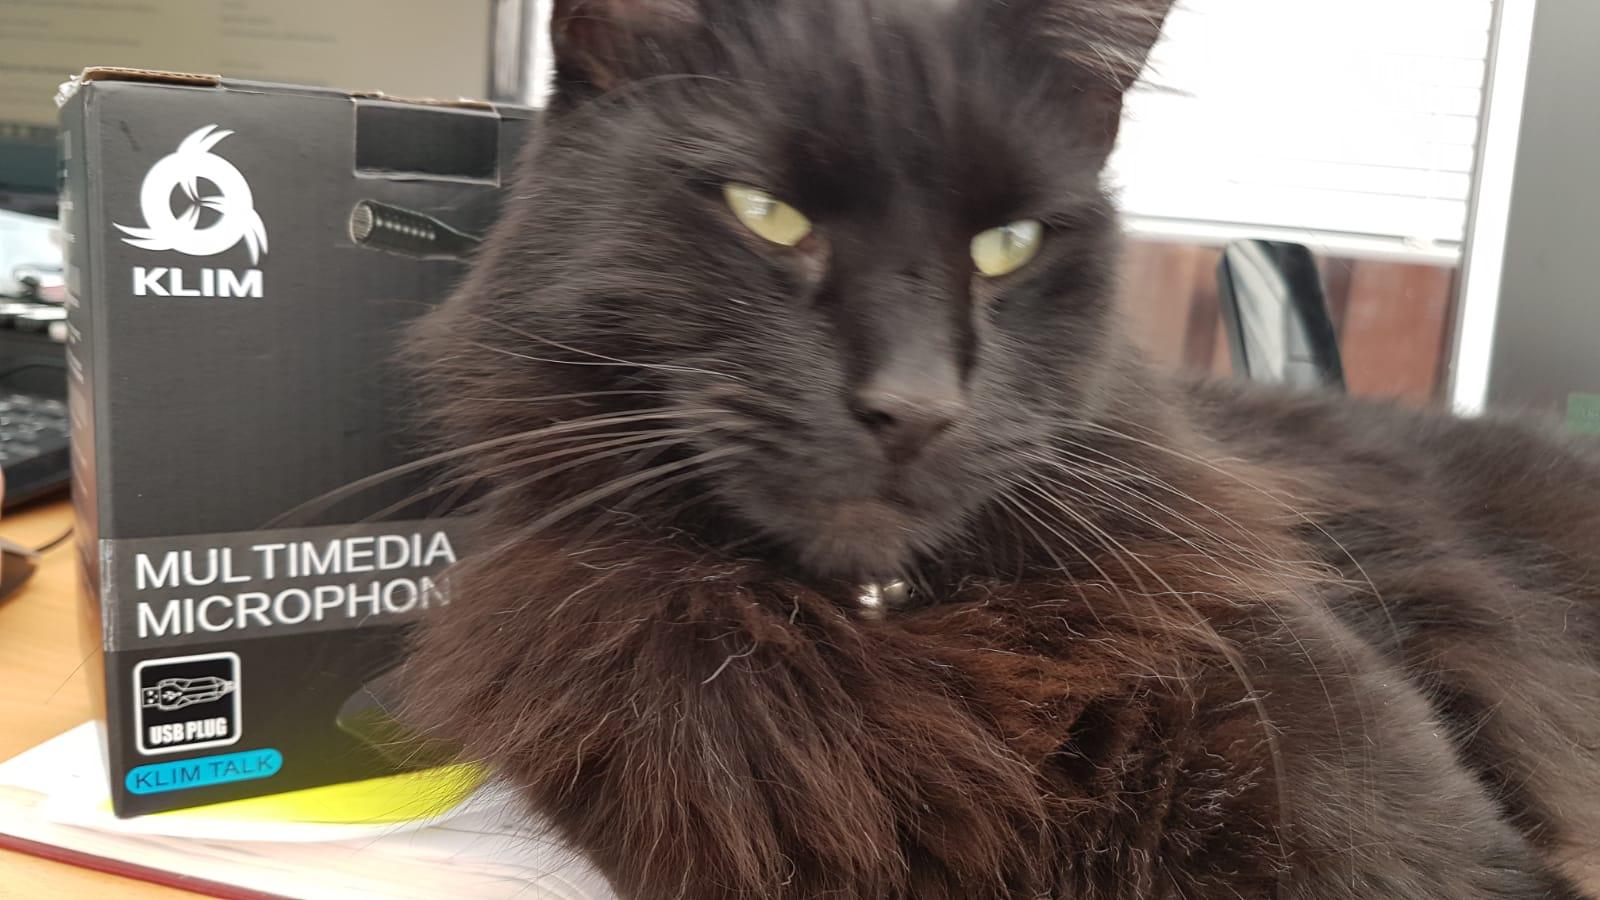 Bazinga the cat with Klim microphone